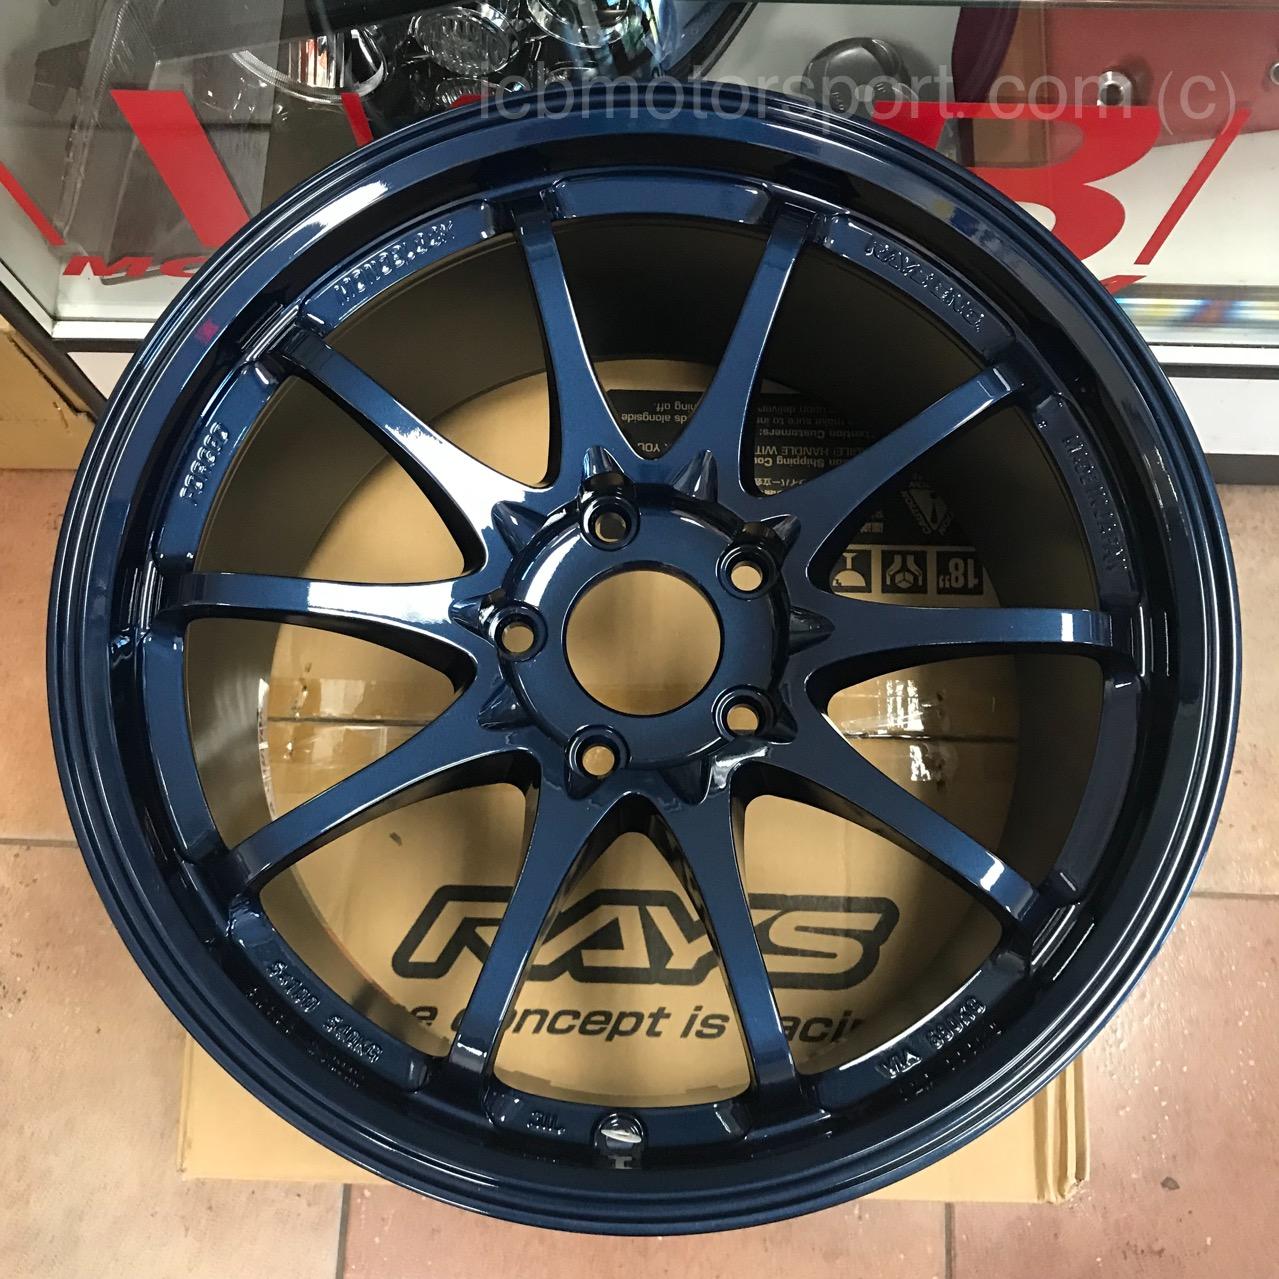 Rays Volk Racing Ce28sl 18x9 5 5x120 44 Offset Mag Blue